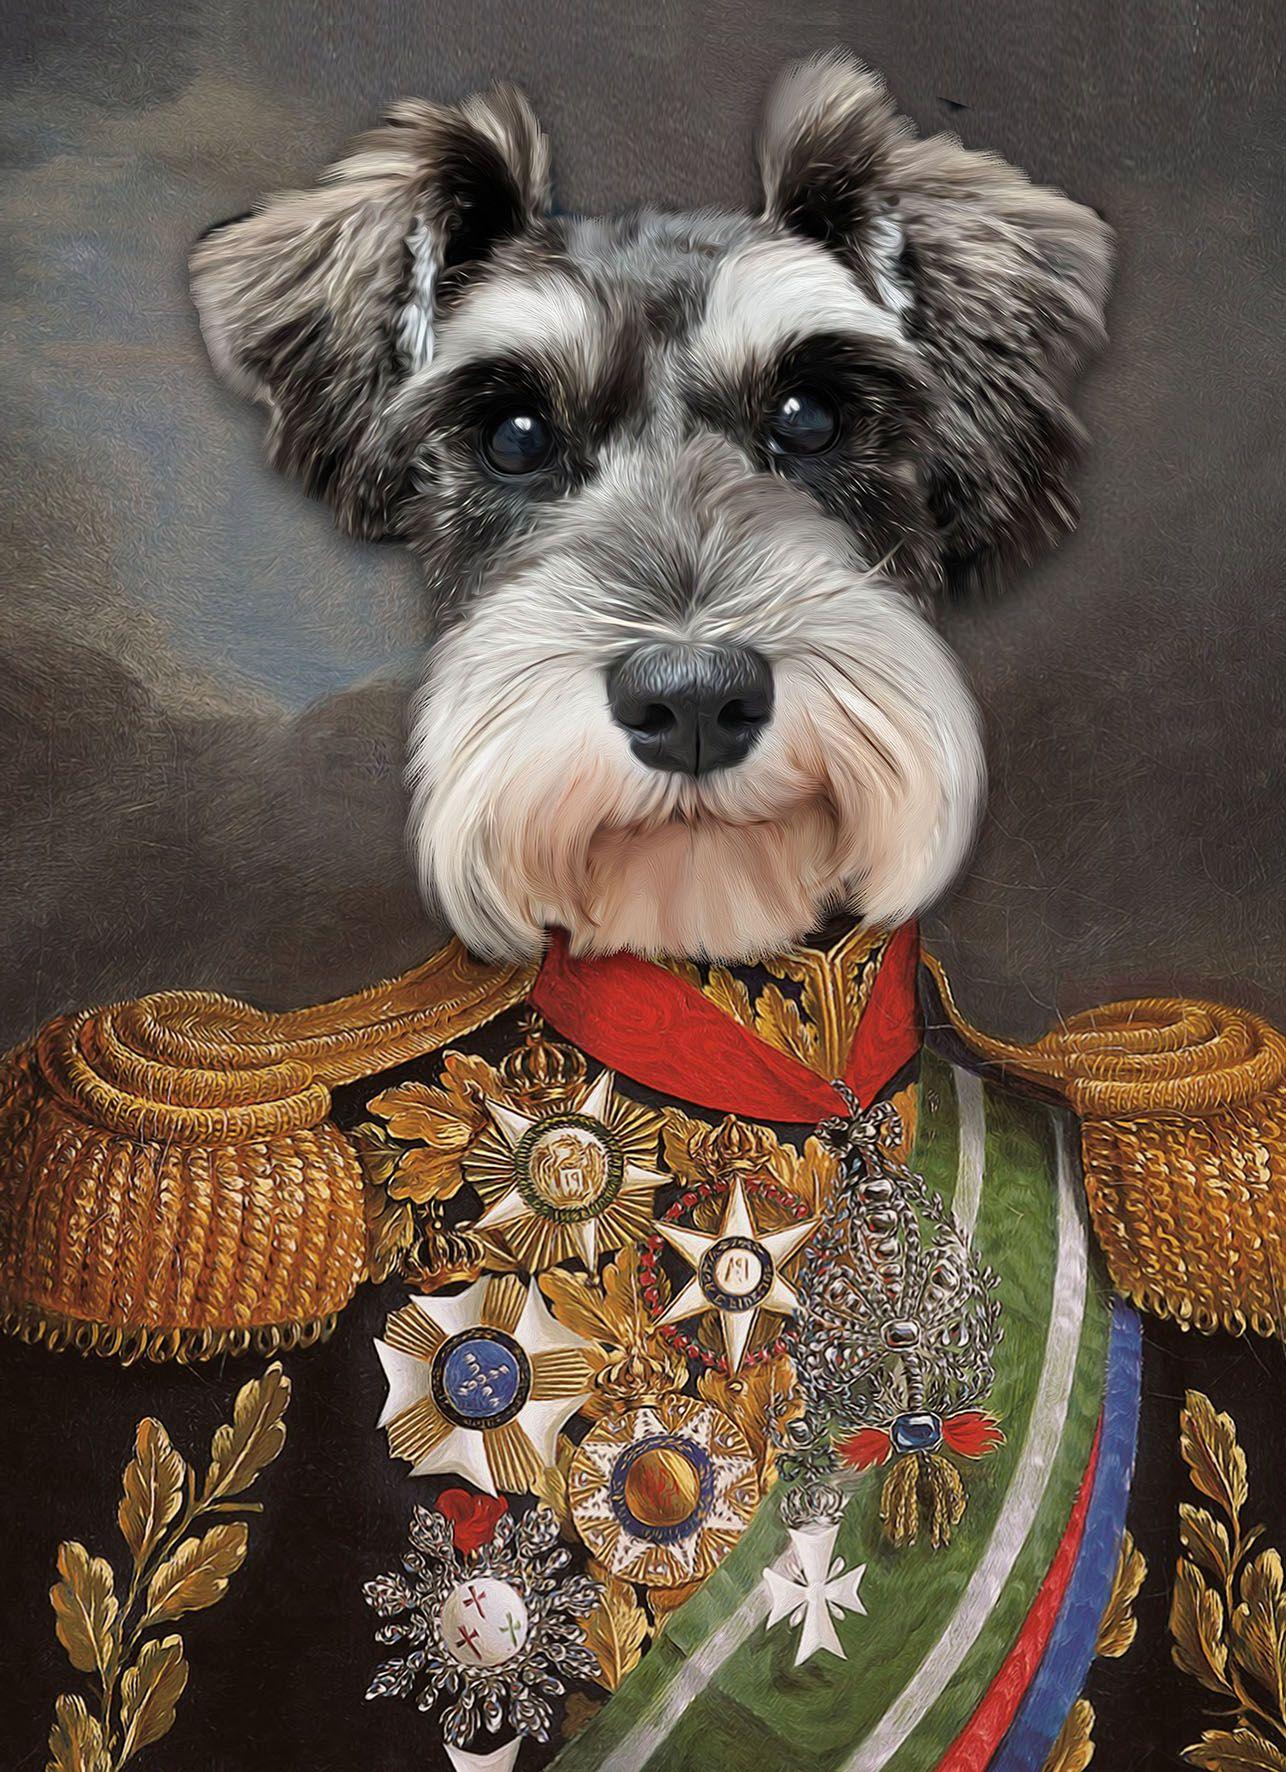 Custom Pet Portrait Your Pet In Military Uniform Pet Portrait Custom Portrait Unique Gifts Dog Art Unique Gift Dog Painting Custom Painting In 2020 Animal Portraits Art Dog Portraits Dog Canvas Painting